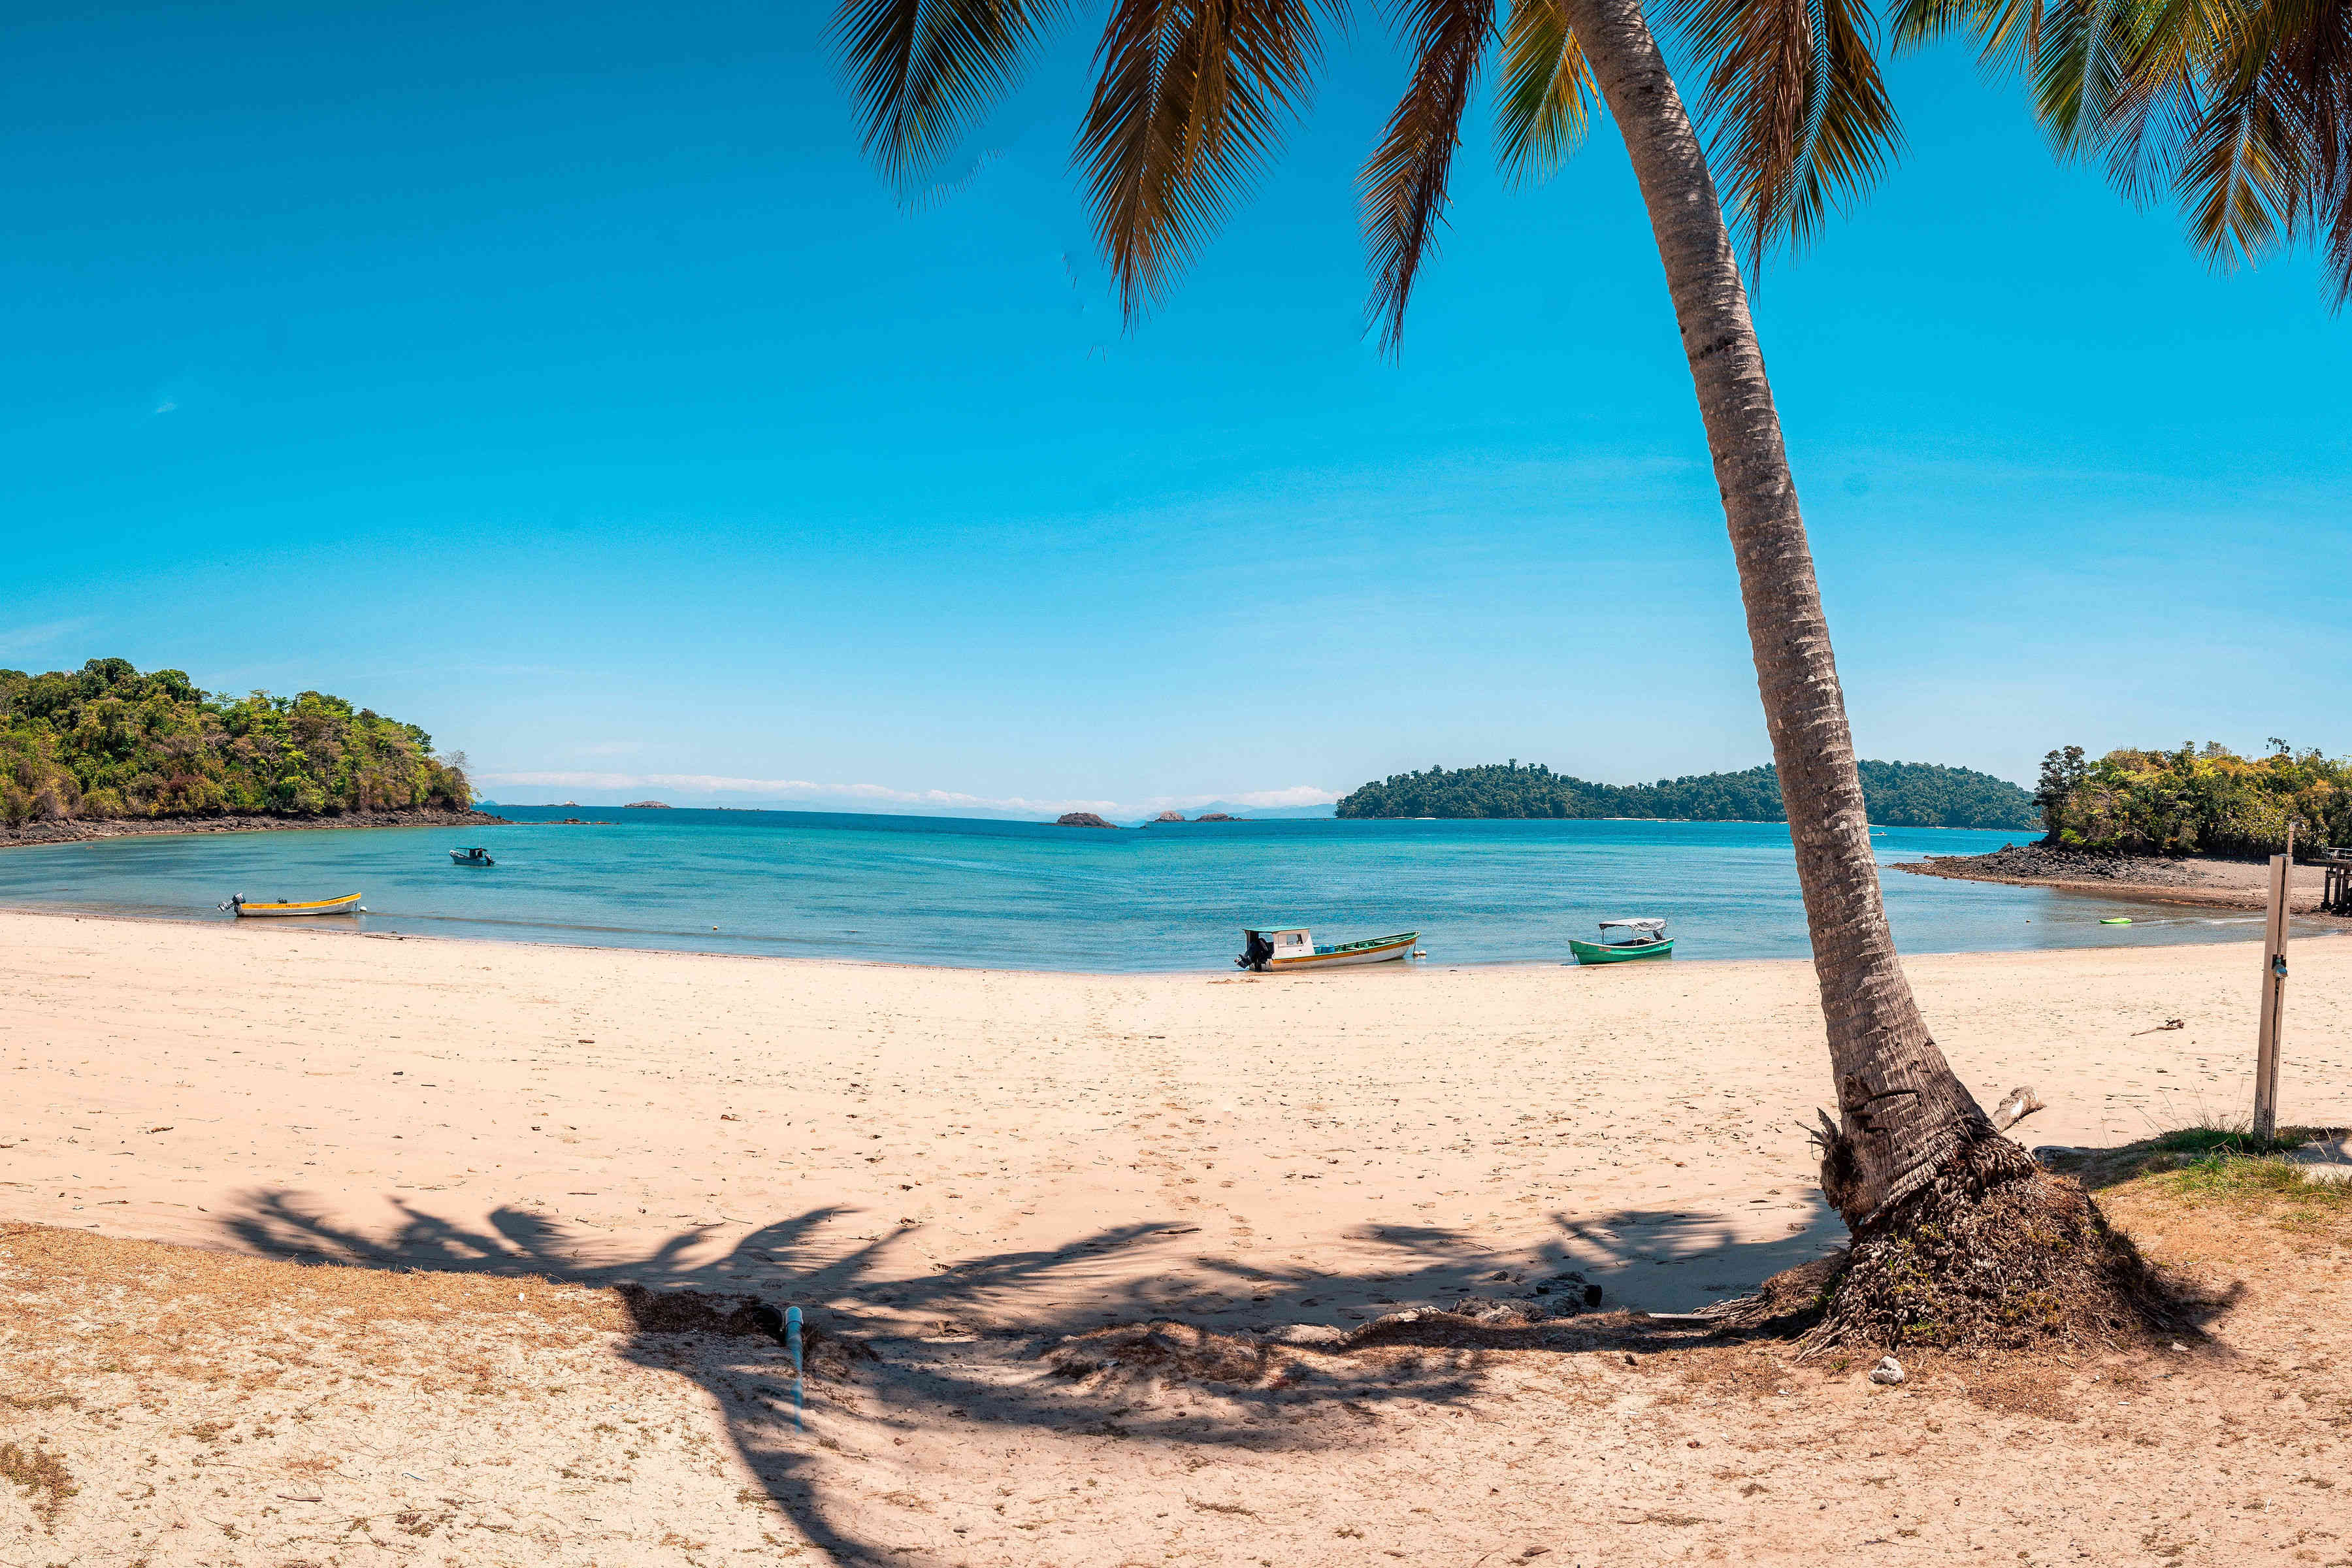 Plano playa y palmera